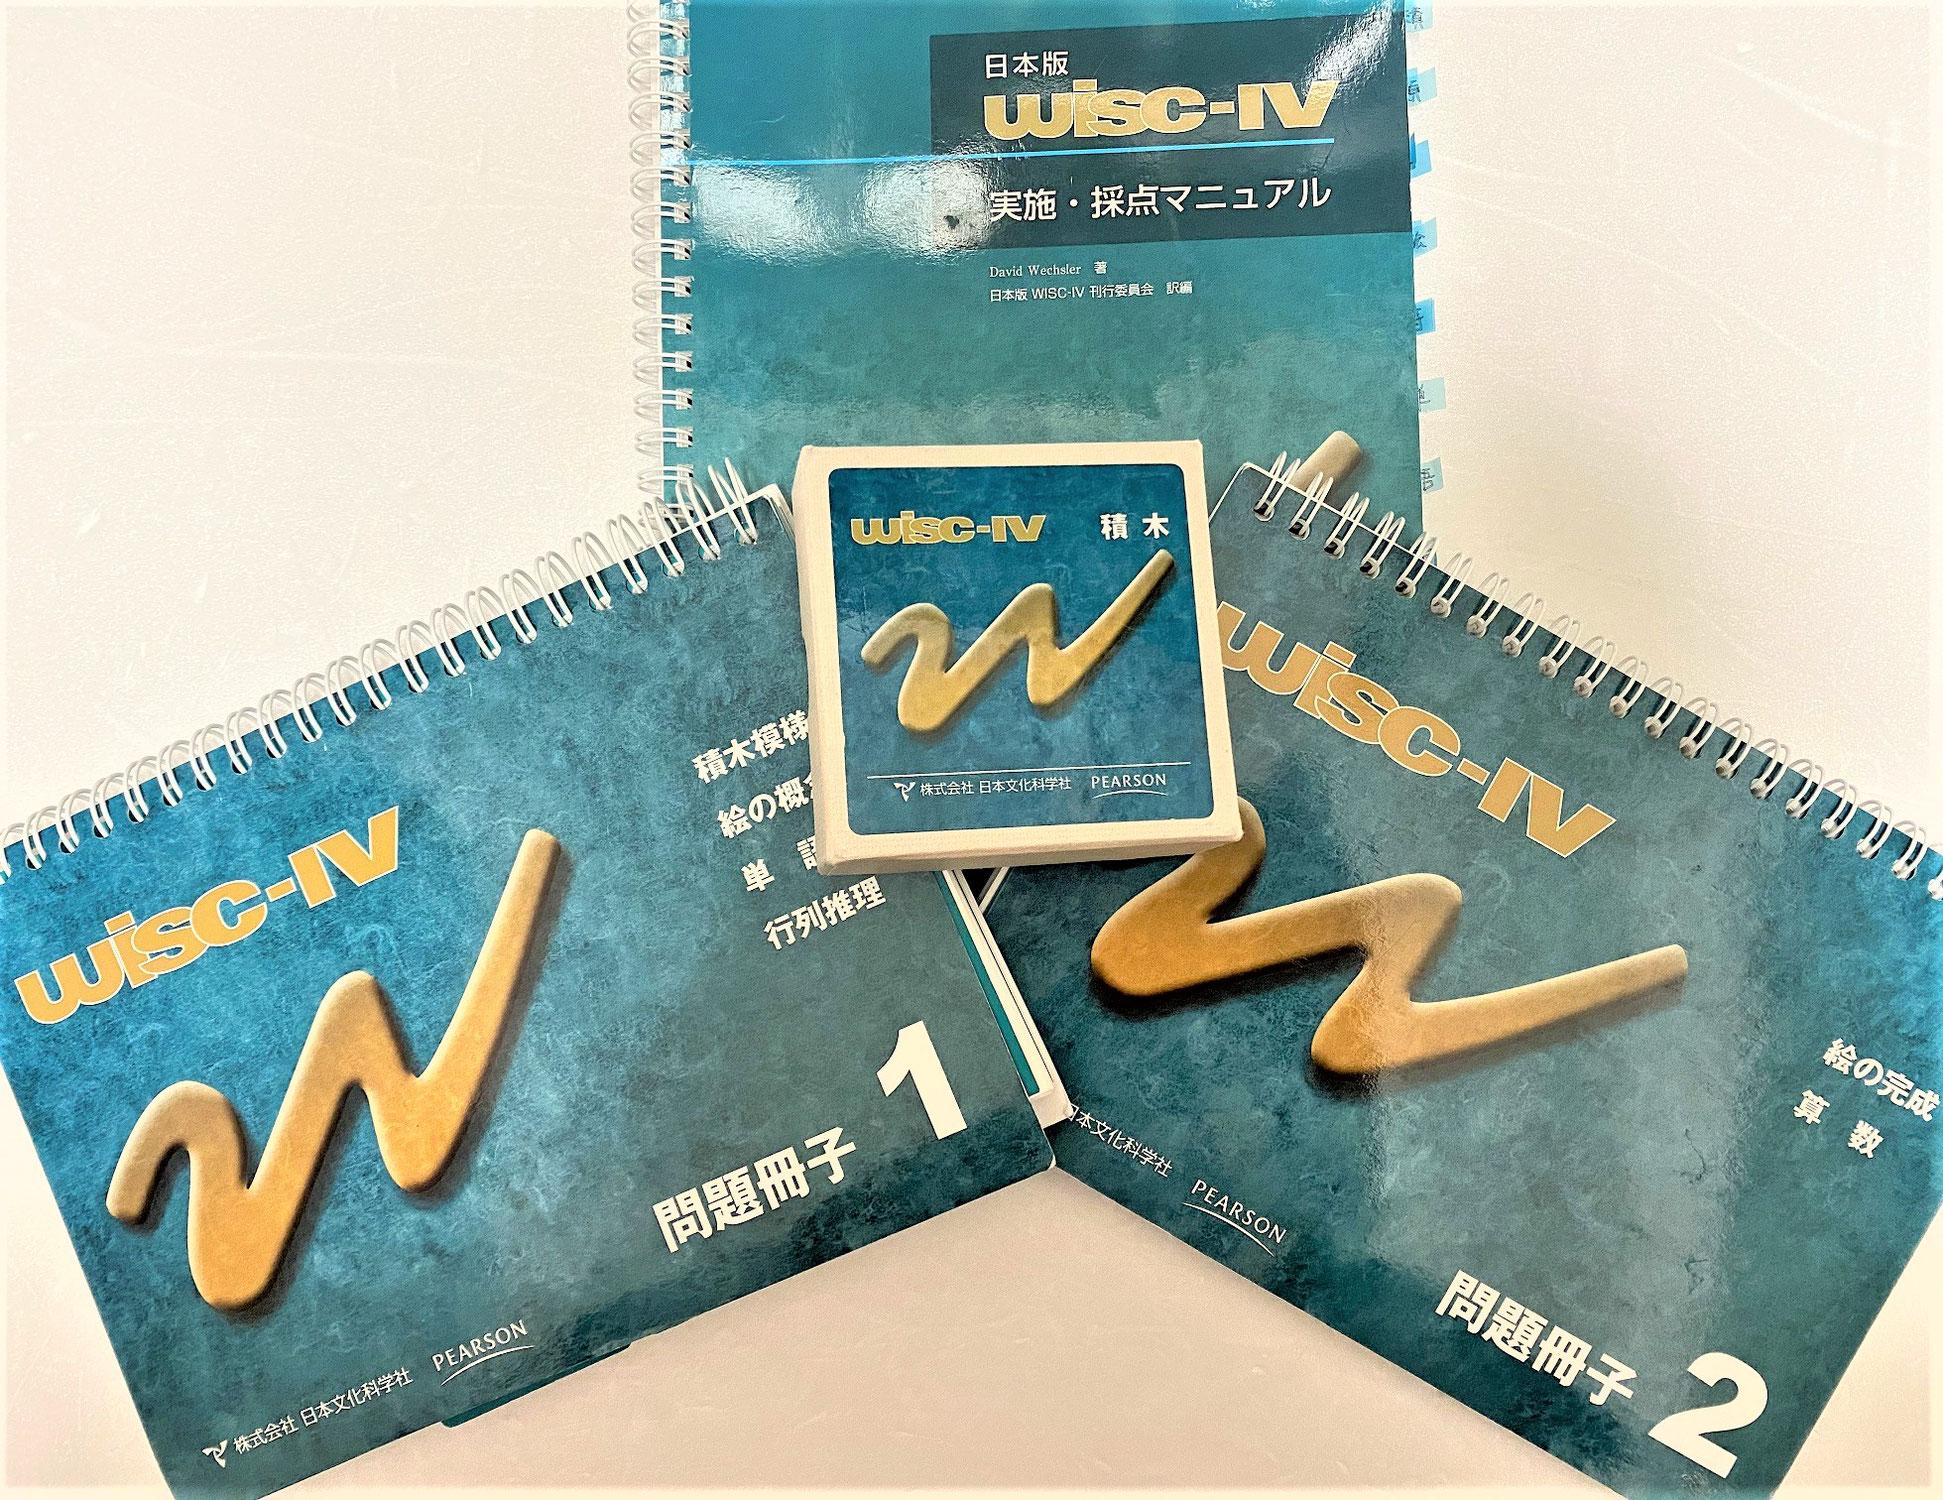 006【WISC-Ⅳ】WISC4 (ウィスク4)検査は何歳から受けられるのか